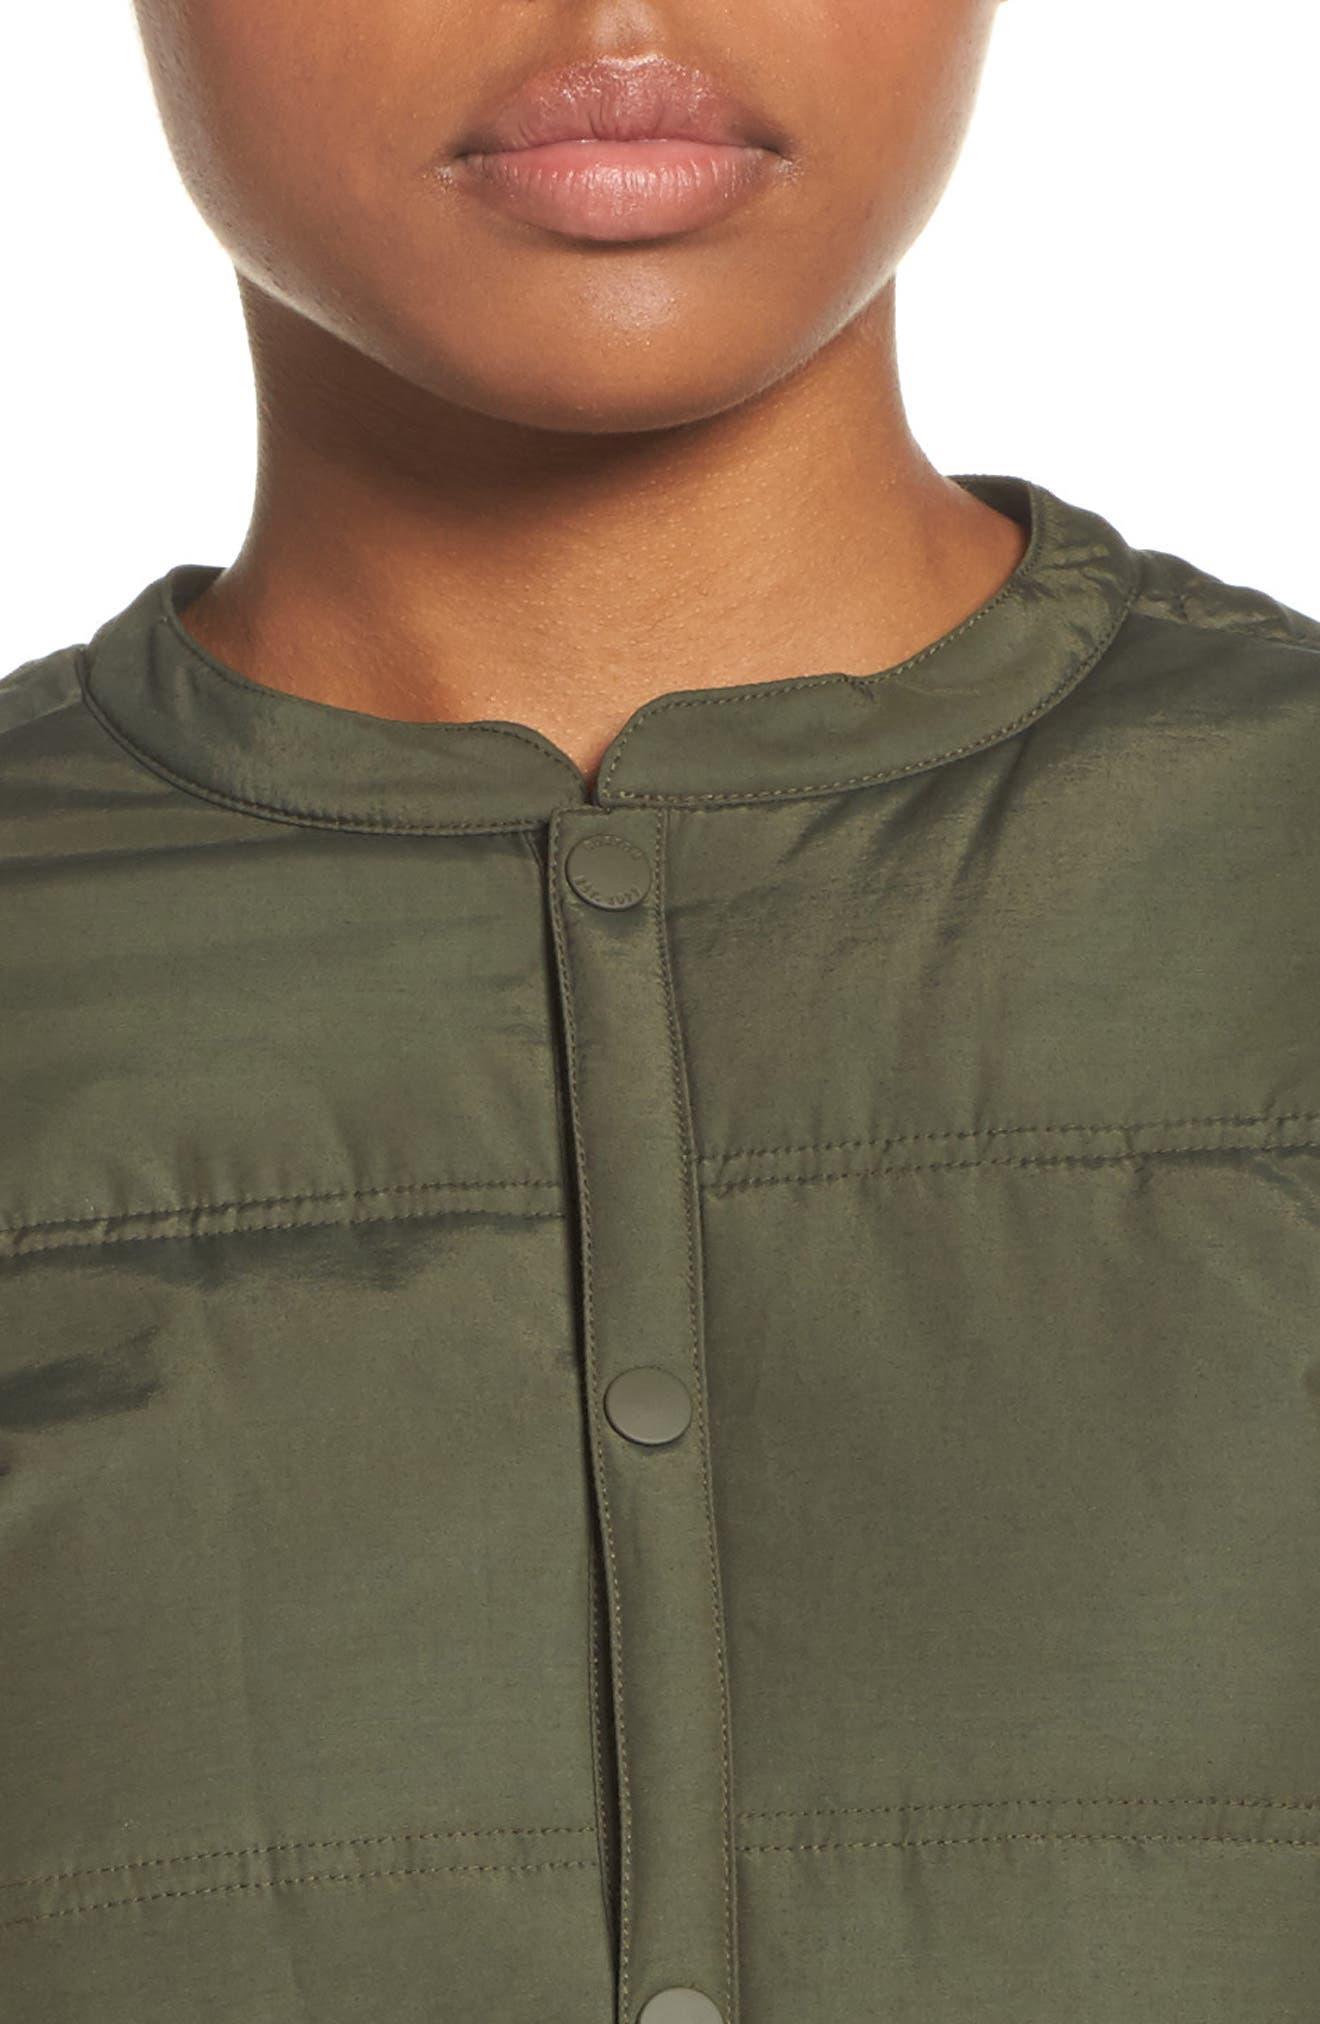 Arliss Insulator Jacket,                             Alternate thumbnail 4, color,                             300